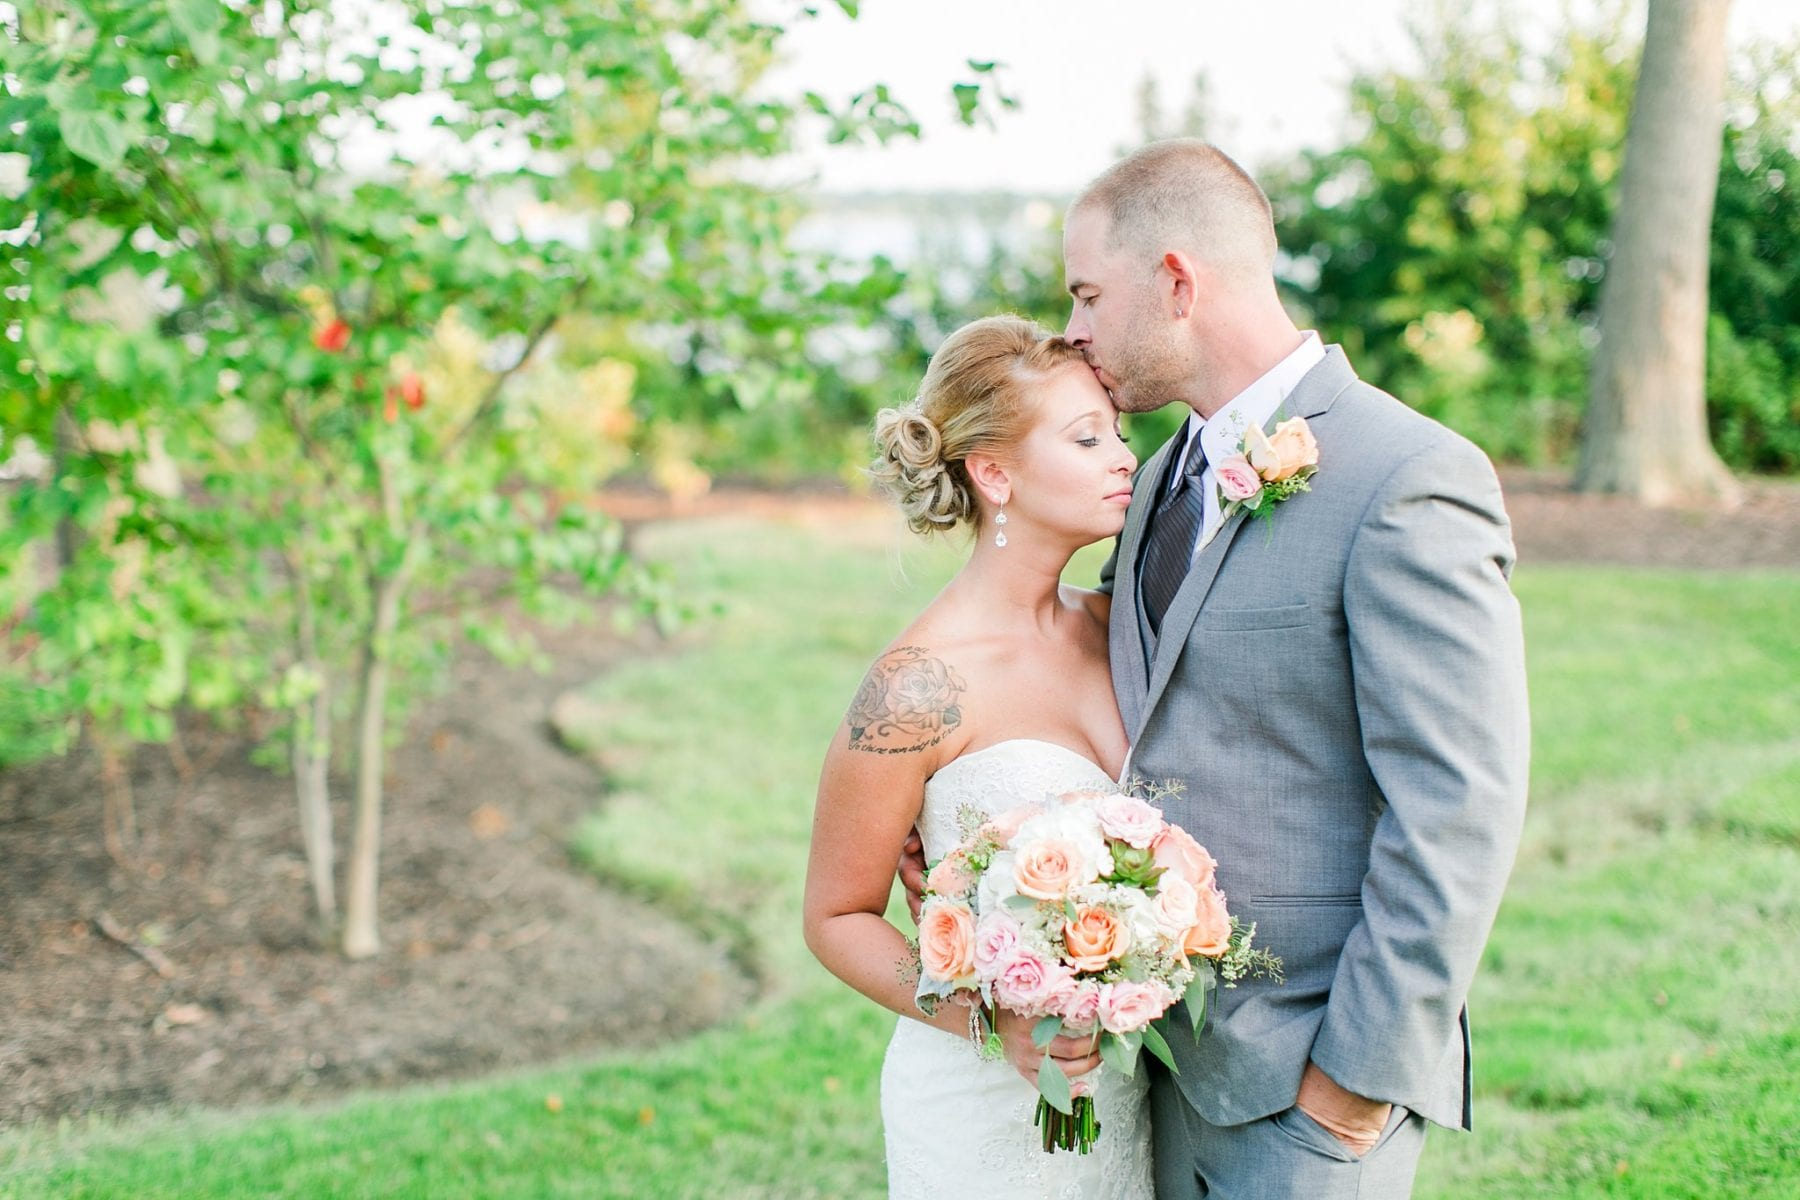 Waters Edge Wedding Photos Maryland Wedding Photographer Megan Kelsey Photography Katie & Conor-493.JPG